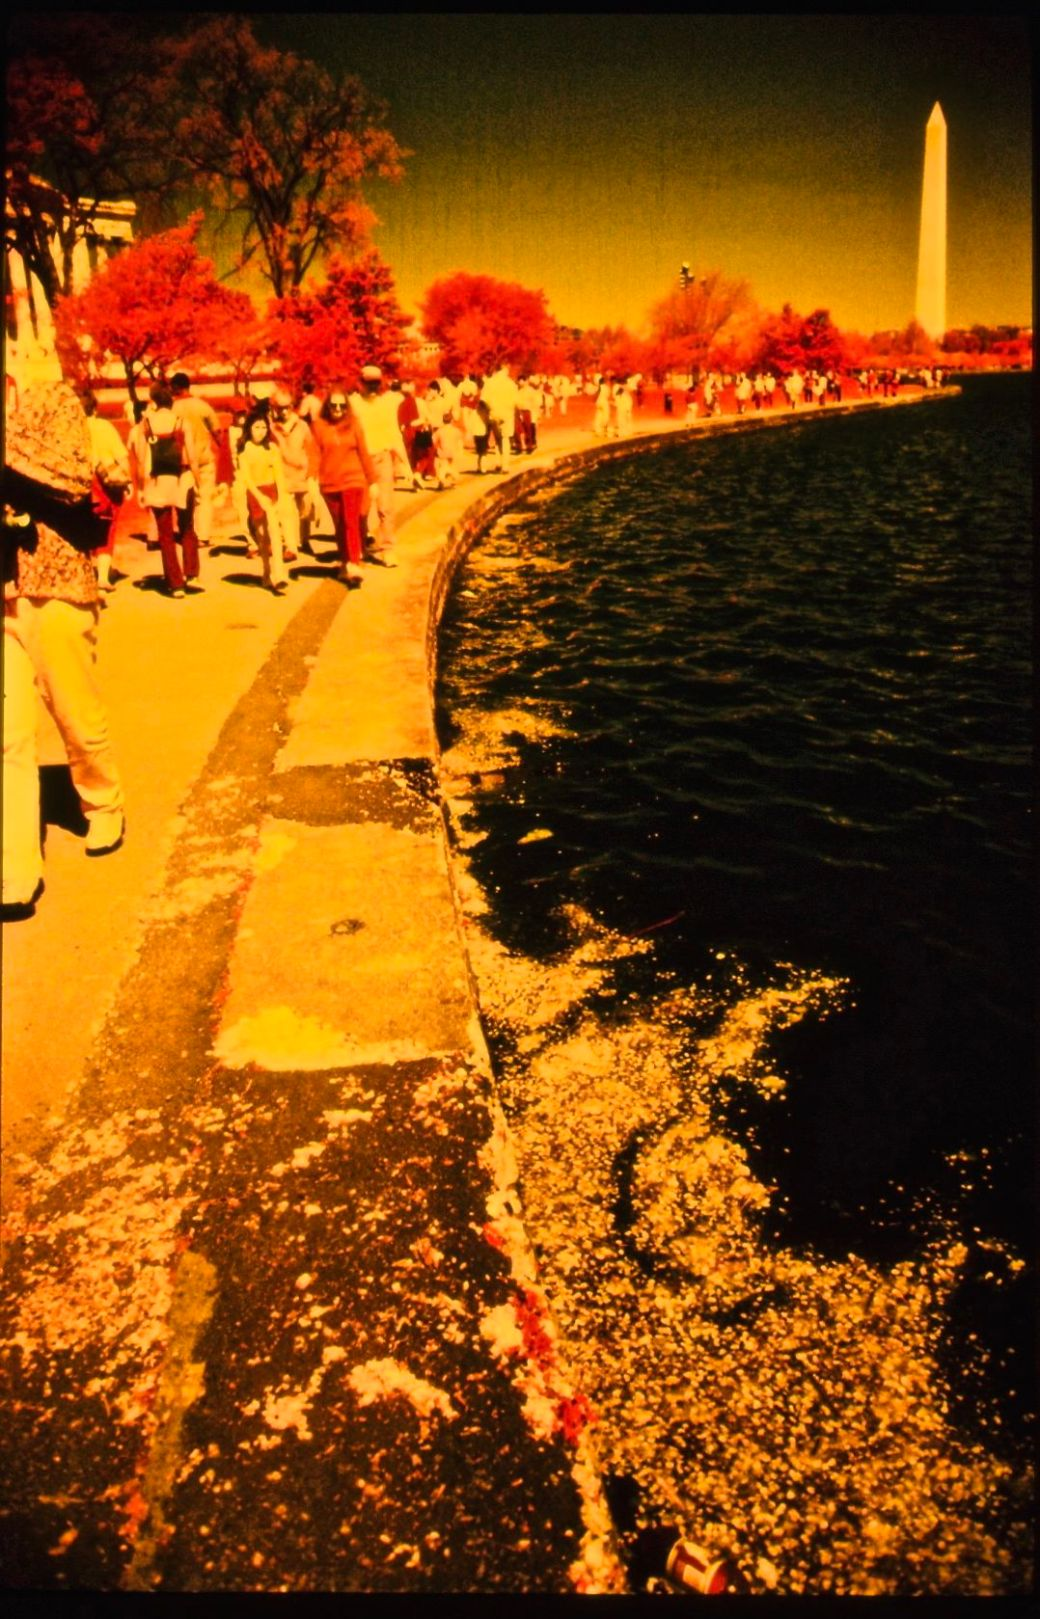 washington dc cherry blossoms color infrared film 2001 9